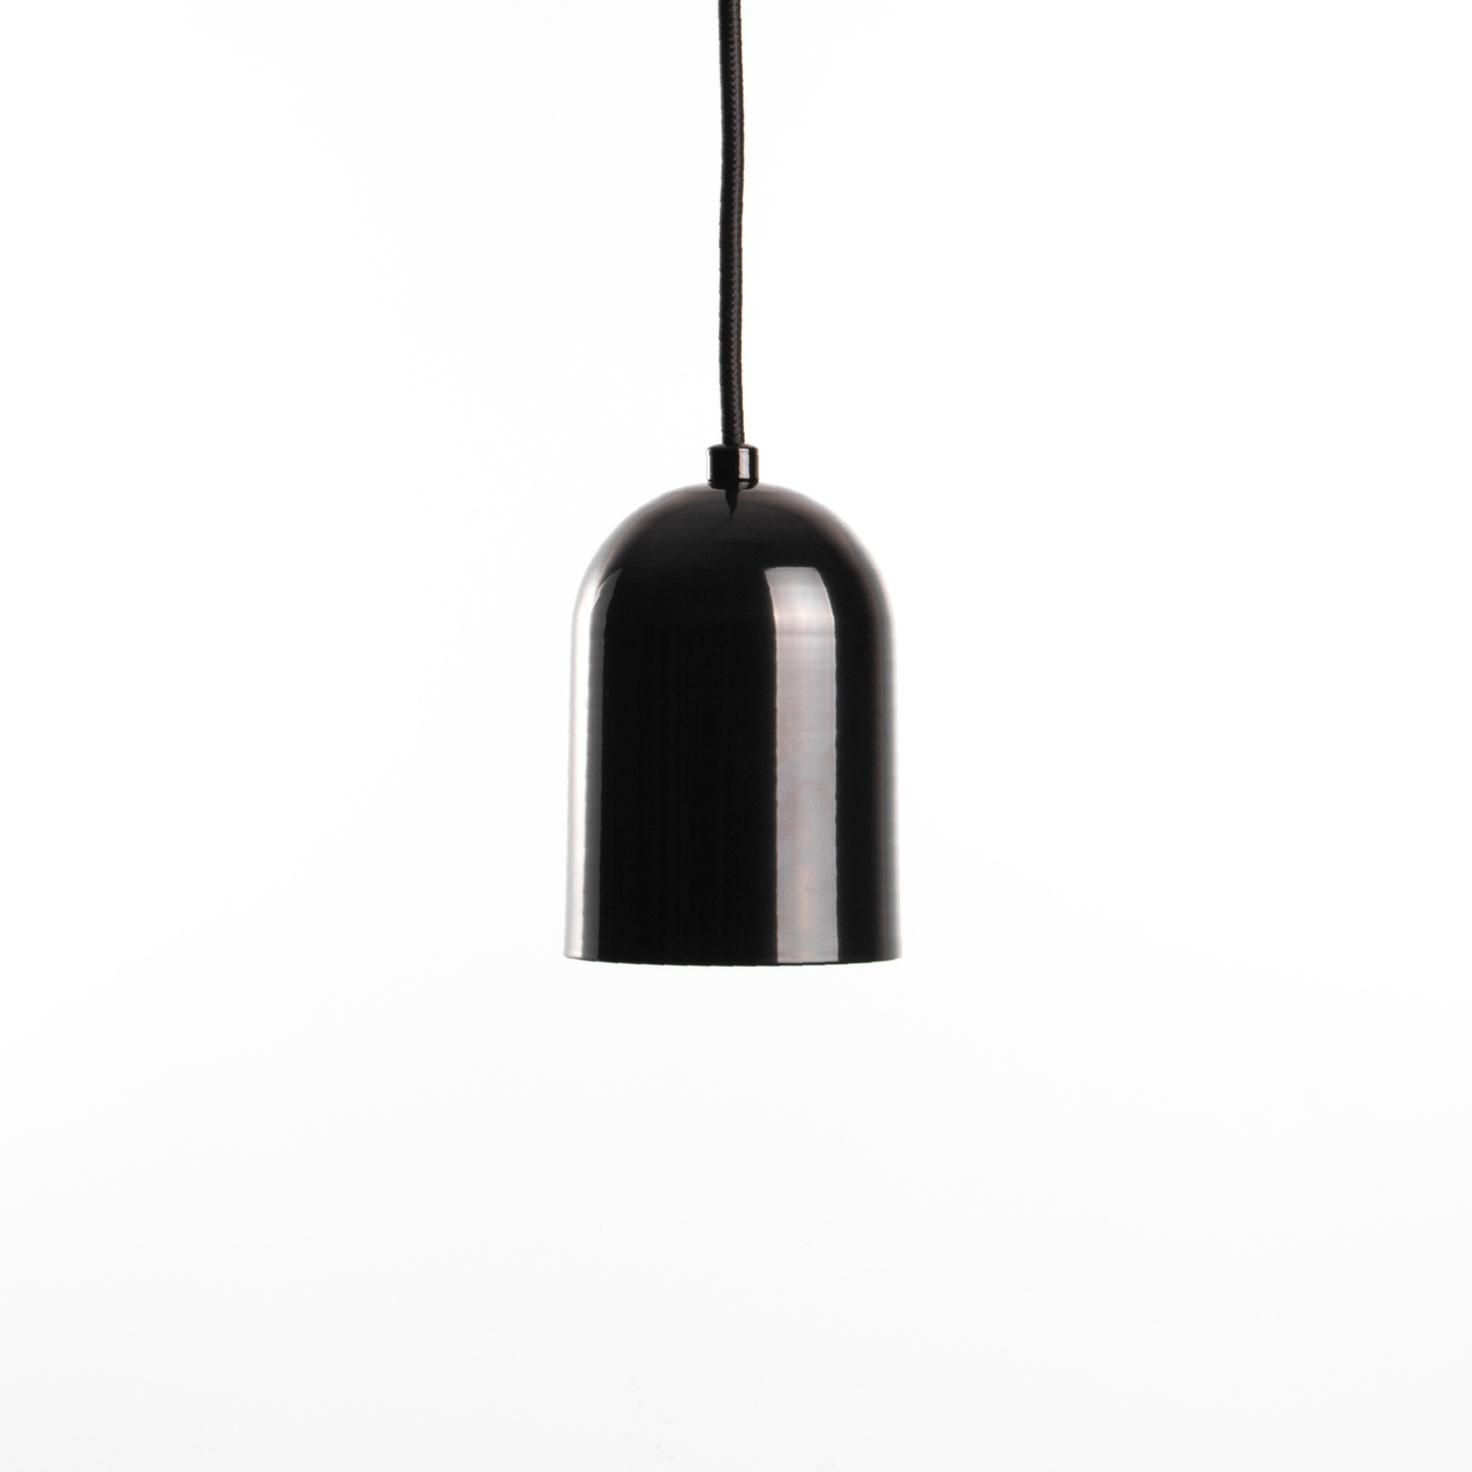 CTR-01 - Pendant Lamp